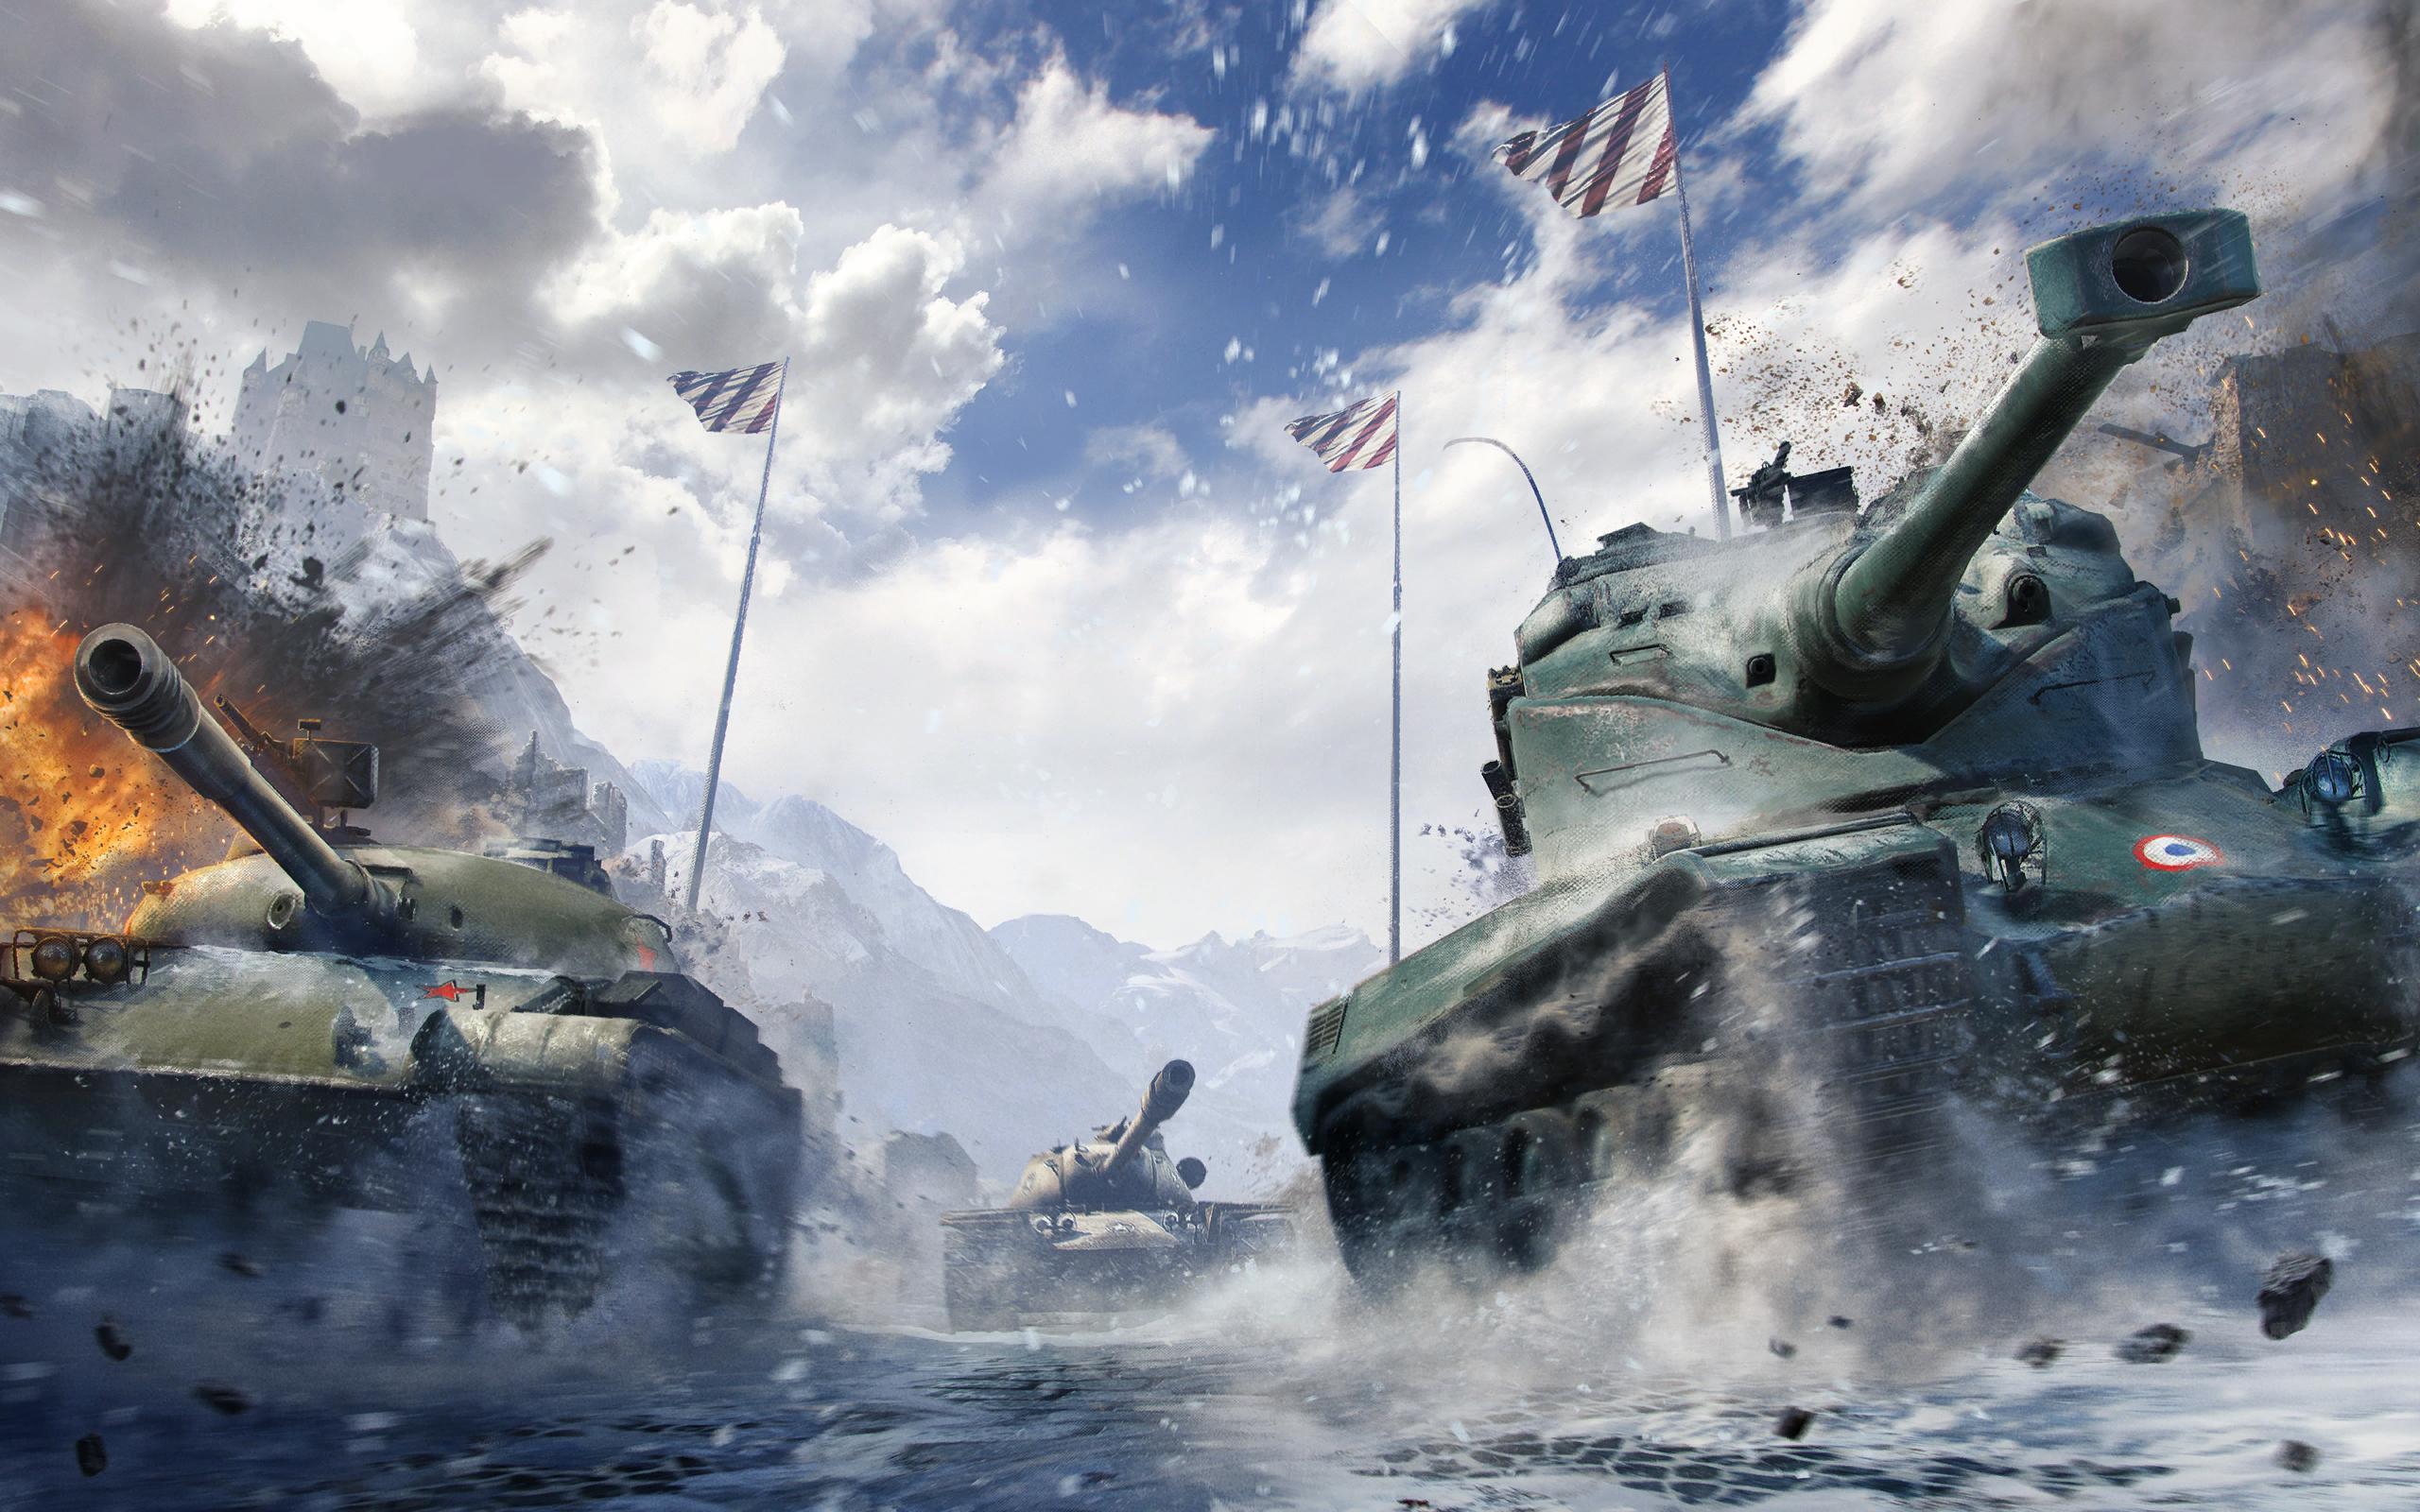 рисунок World of Tanks француз и русский